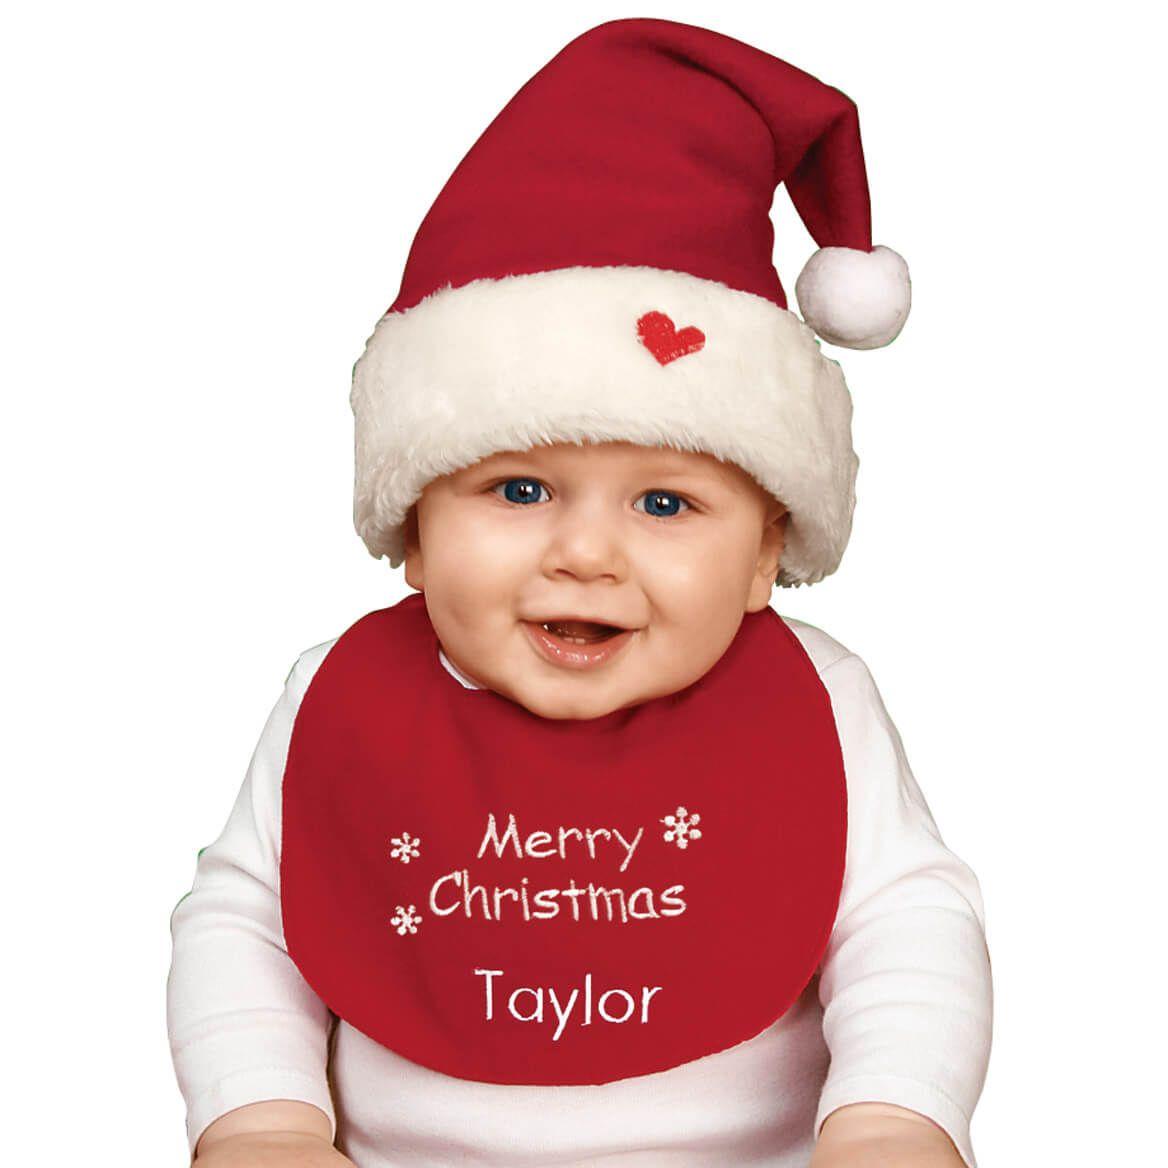 Personalized Childrens Christmas Hat & Bib Set-316844